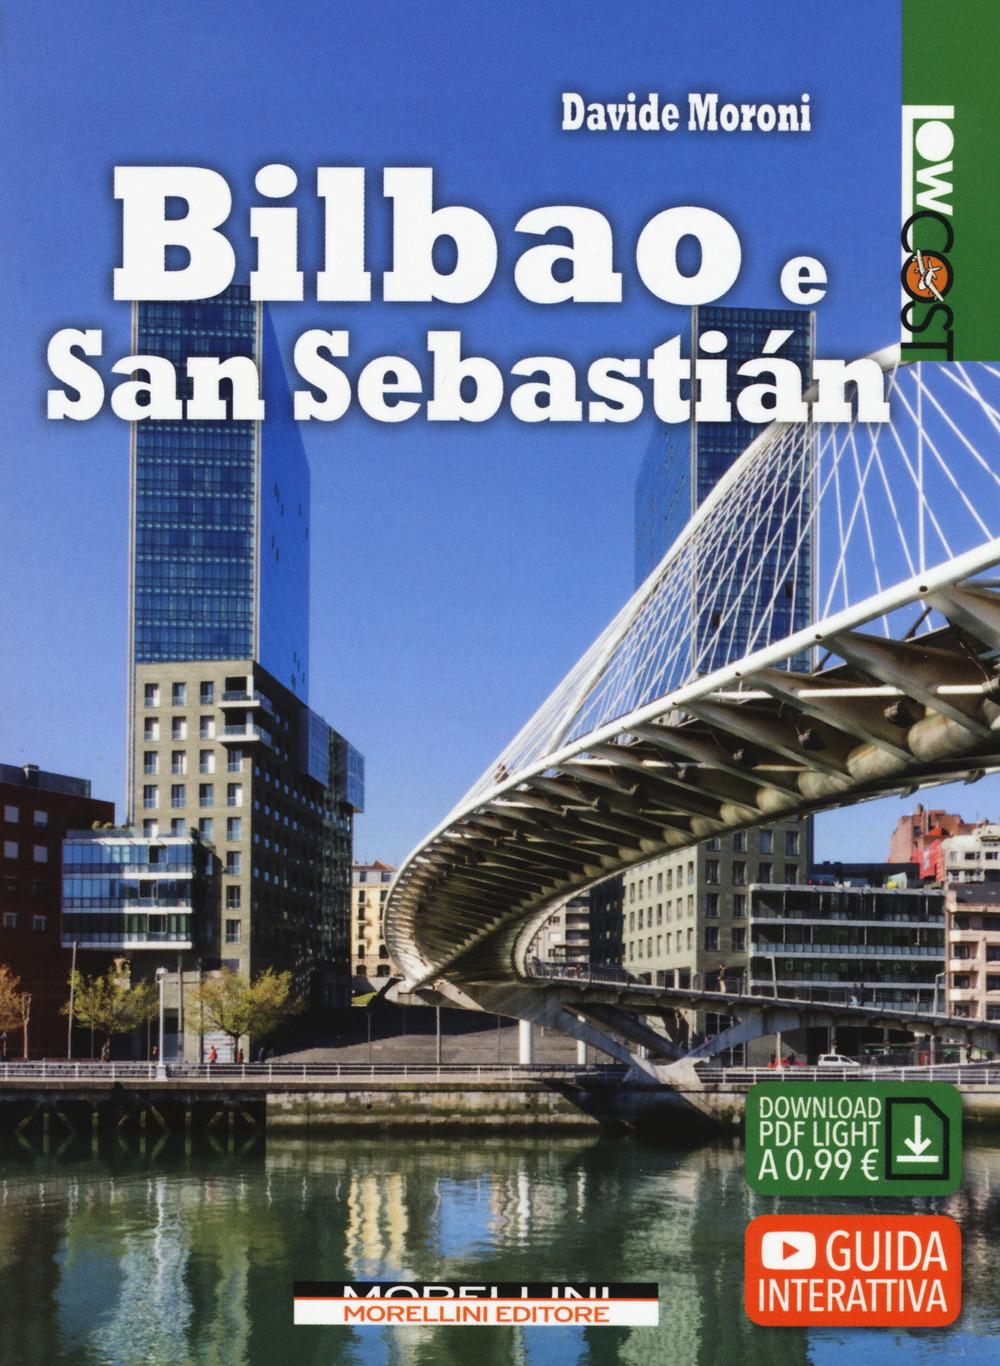 Bilbao e San Sebastián